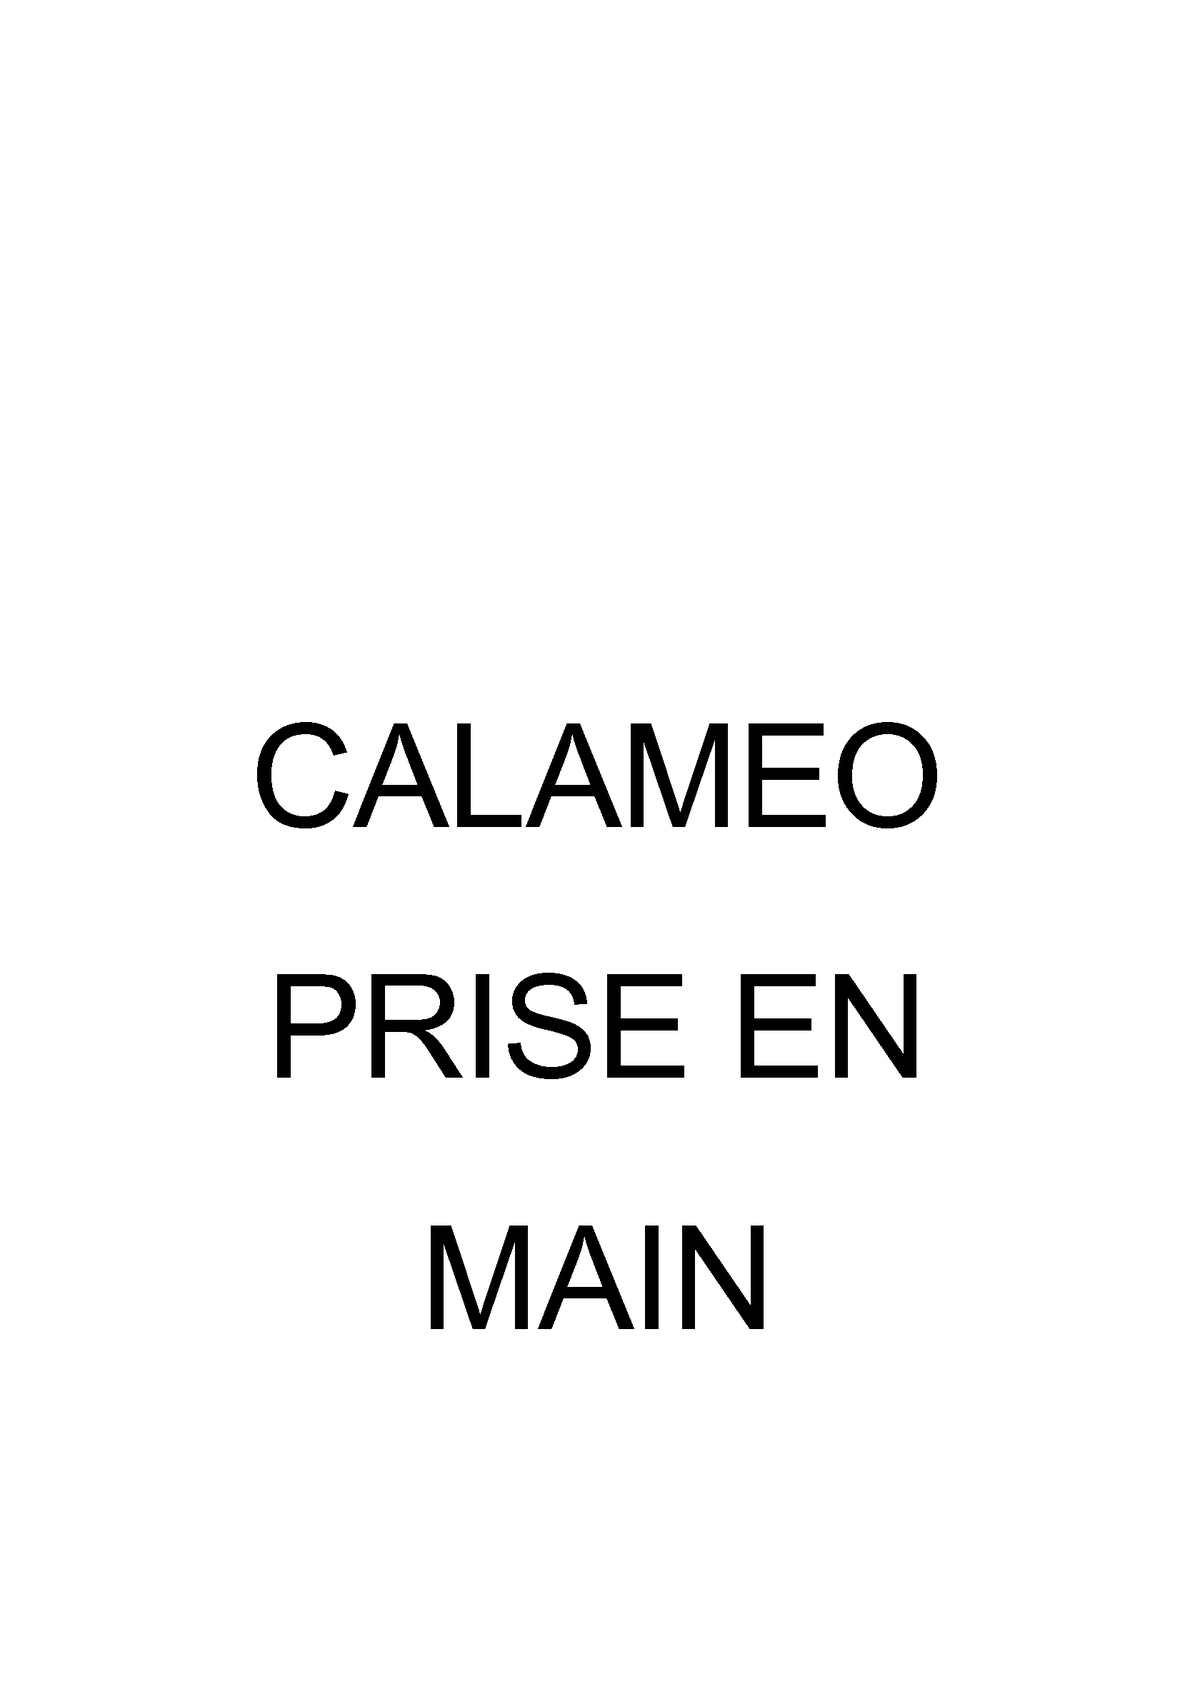 Calameo Exemple